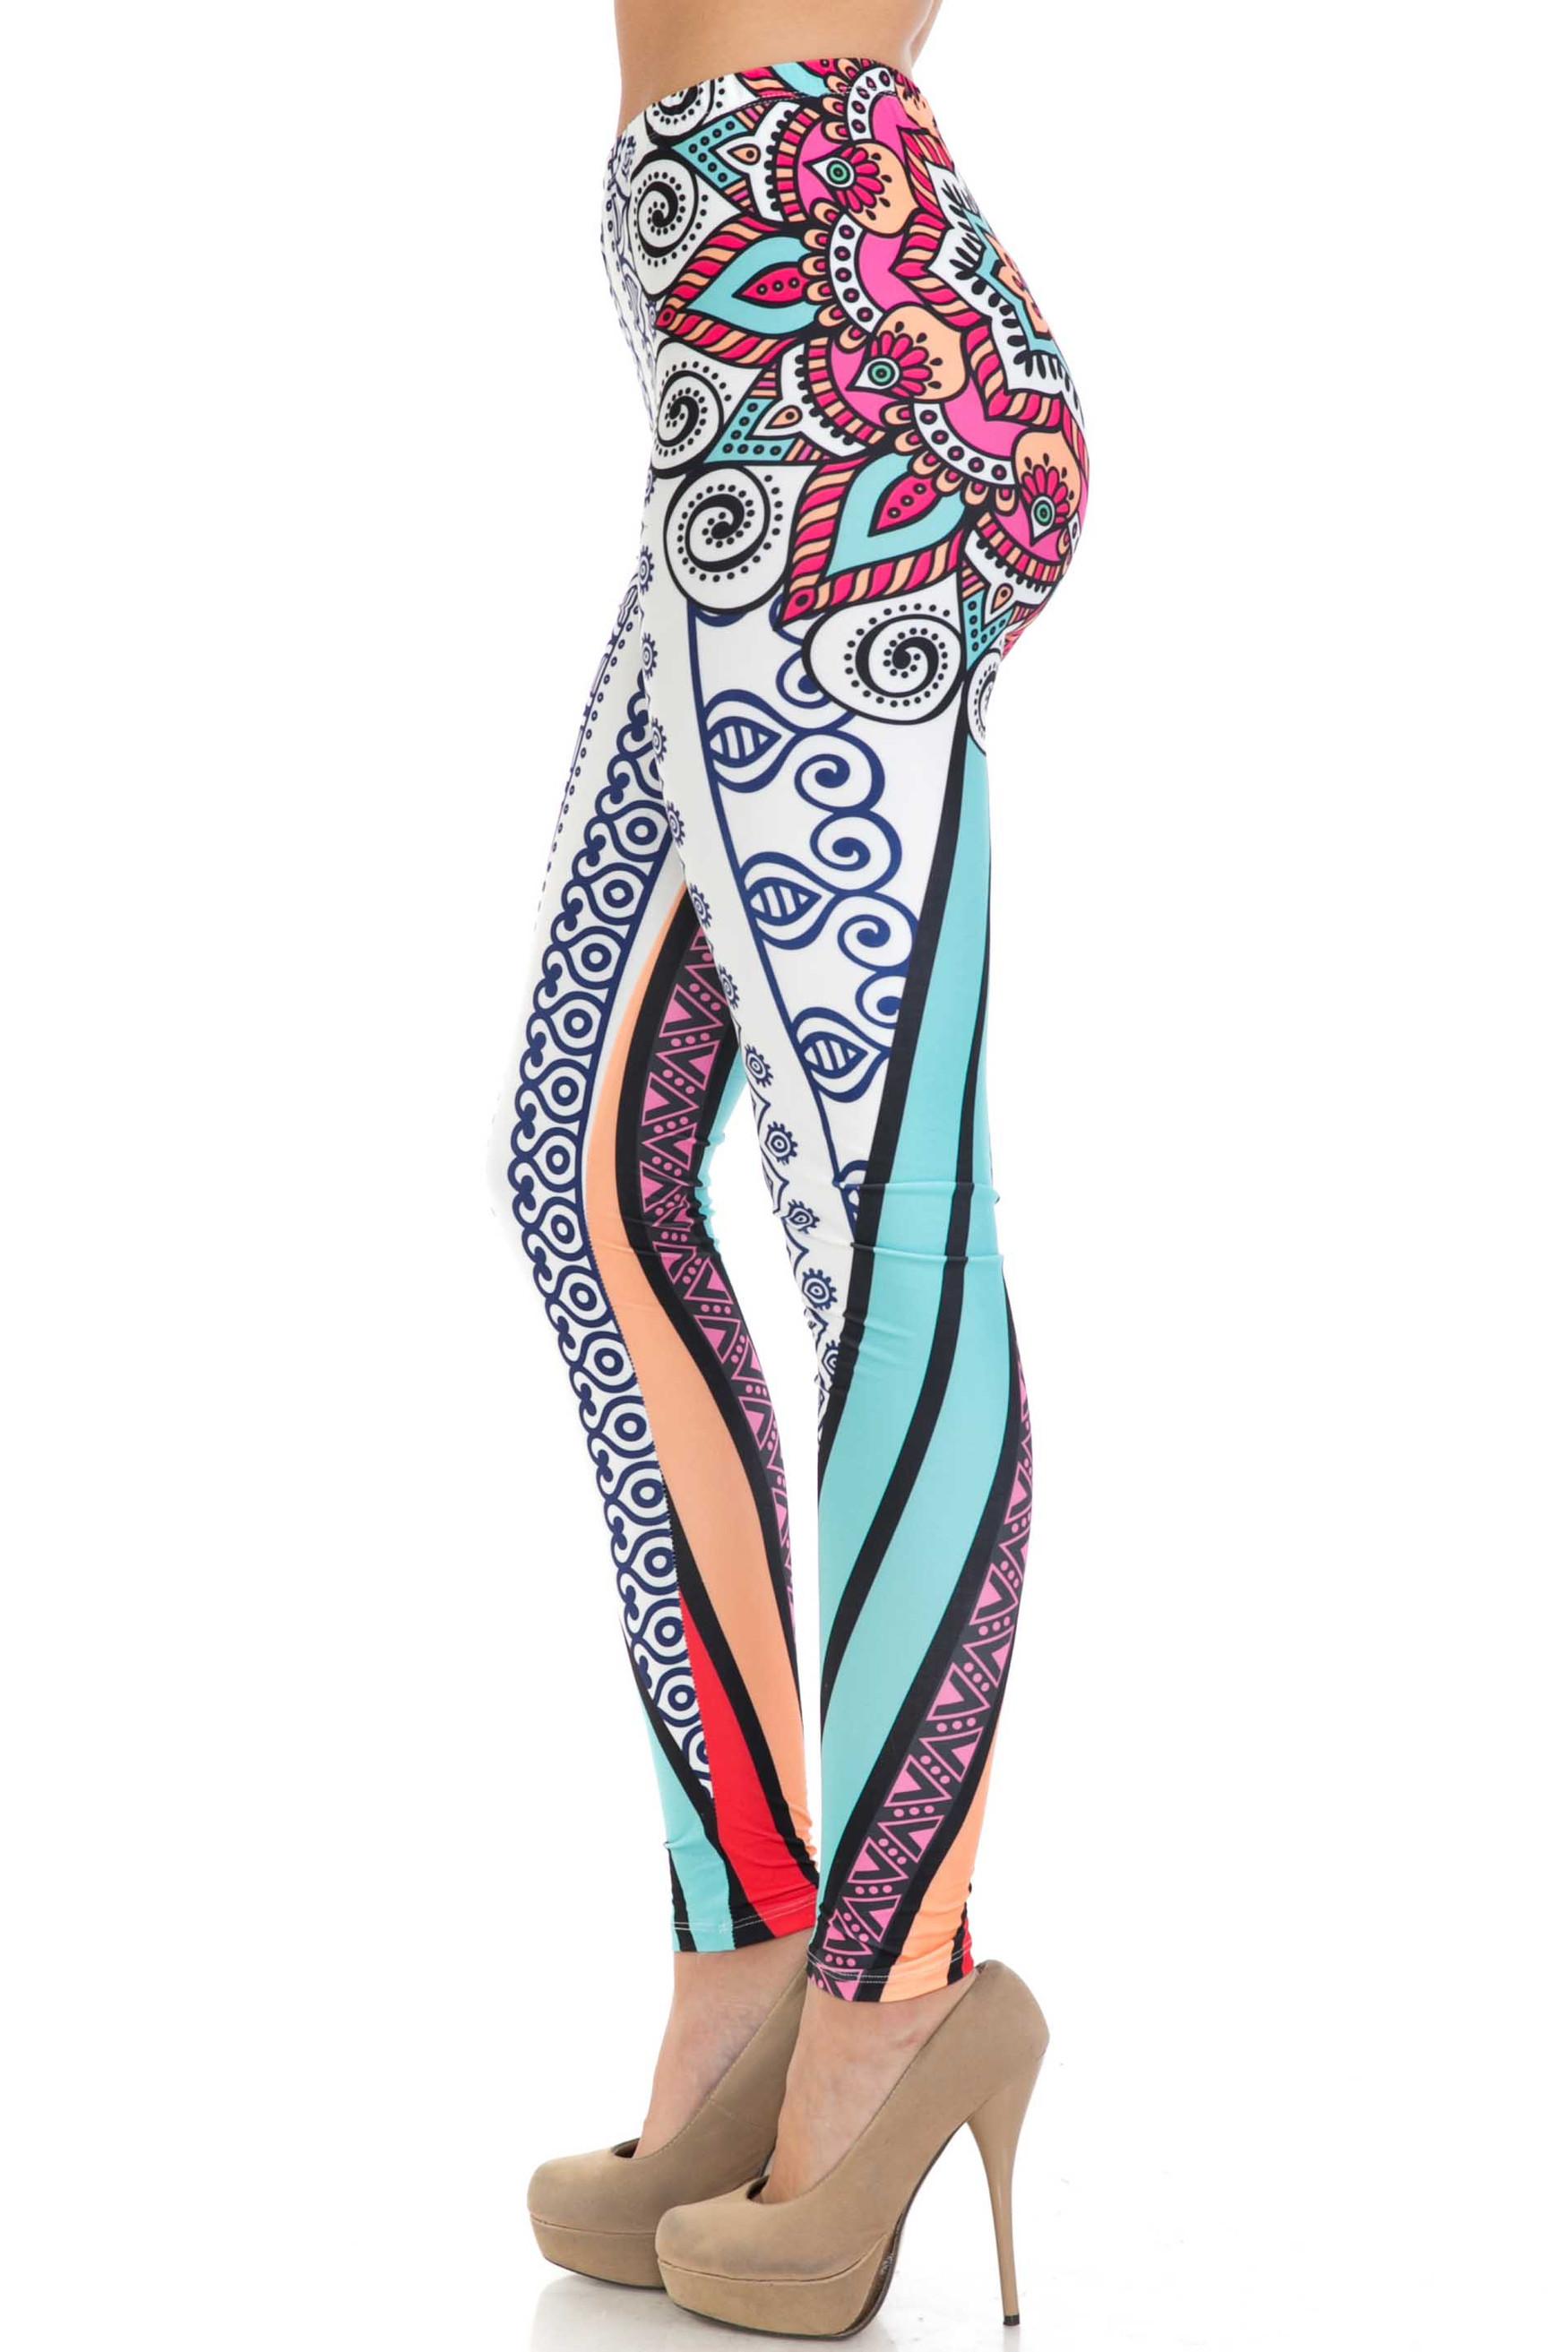 Creamy Soft Sexy Vertical Contouring Mandala Extra Plus Size Leggings - 3X-5X - USA Fashion™